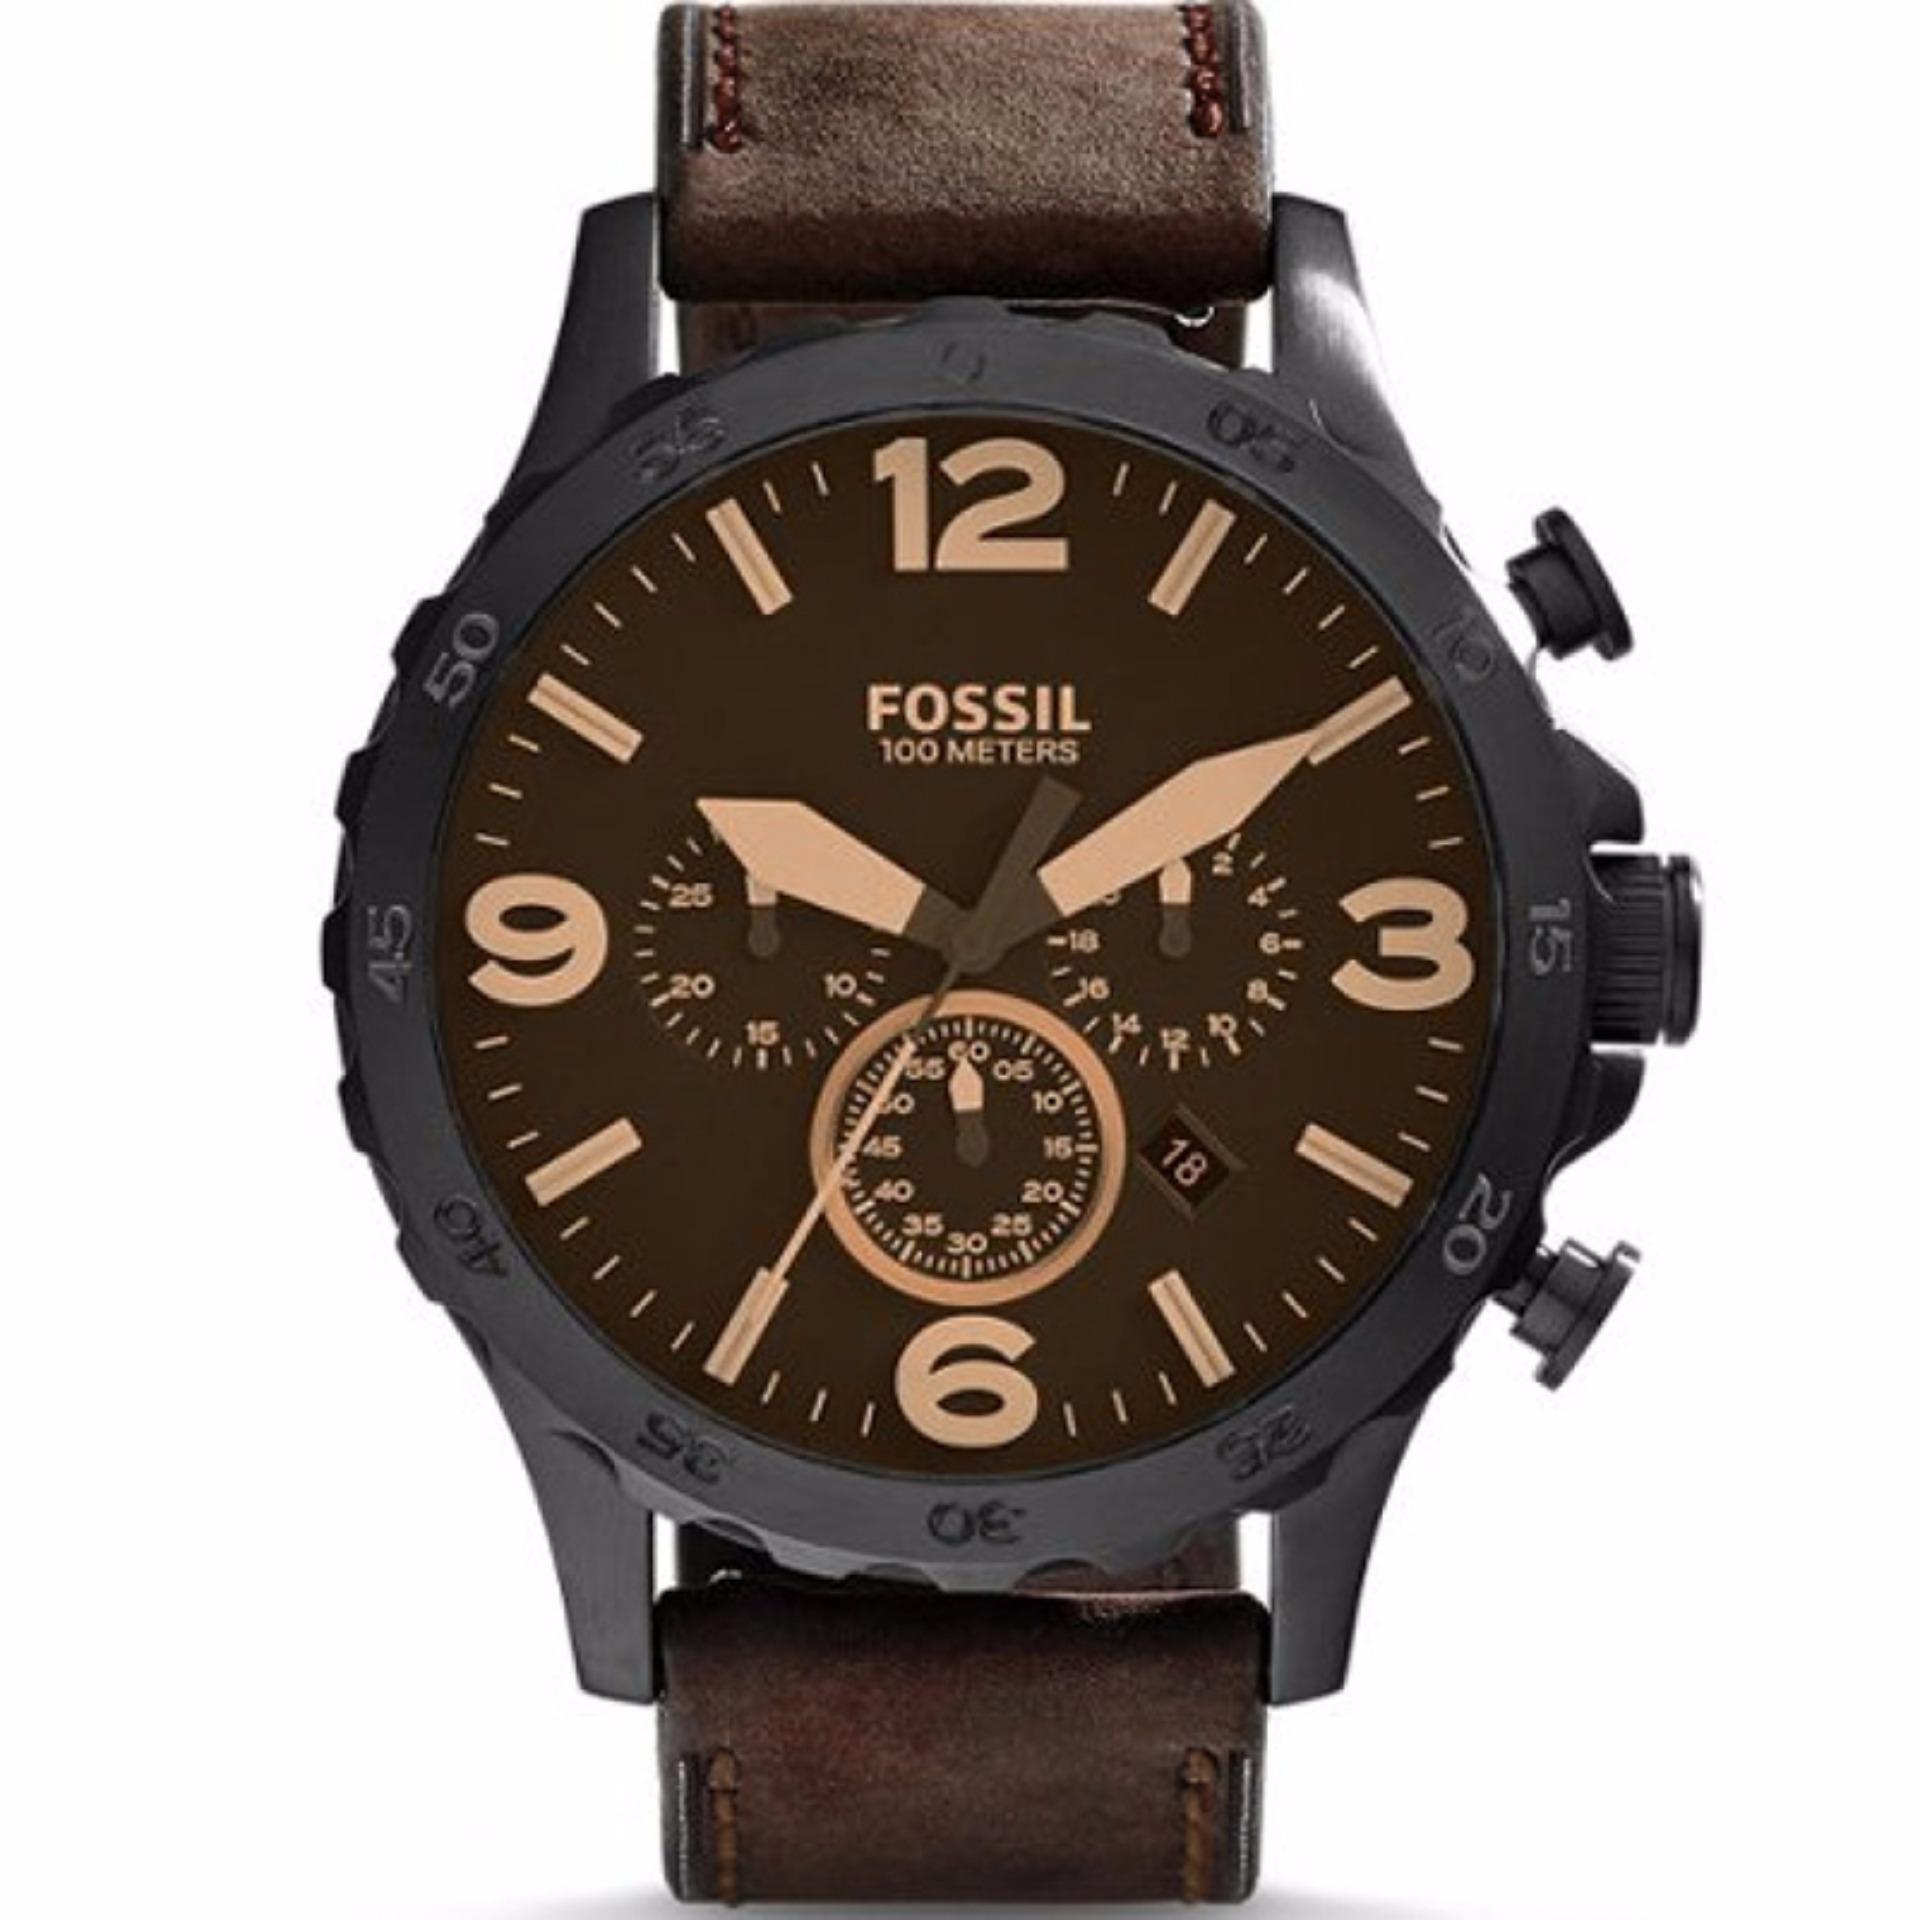 Diskon Fossil Nate Chronograph Jam Tangan Pria Coklat Tali Kulit Jr1487 Fossil